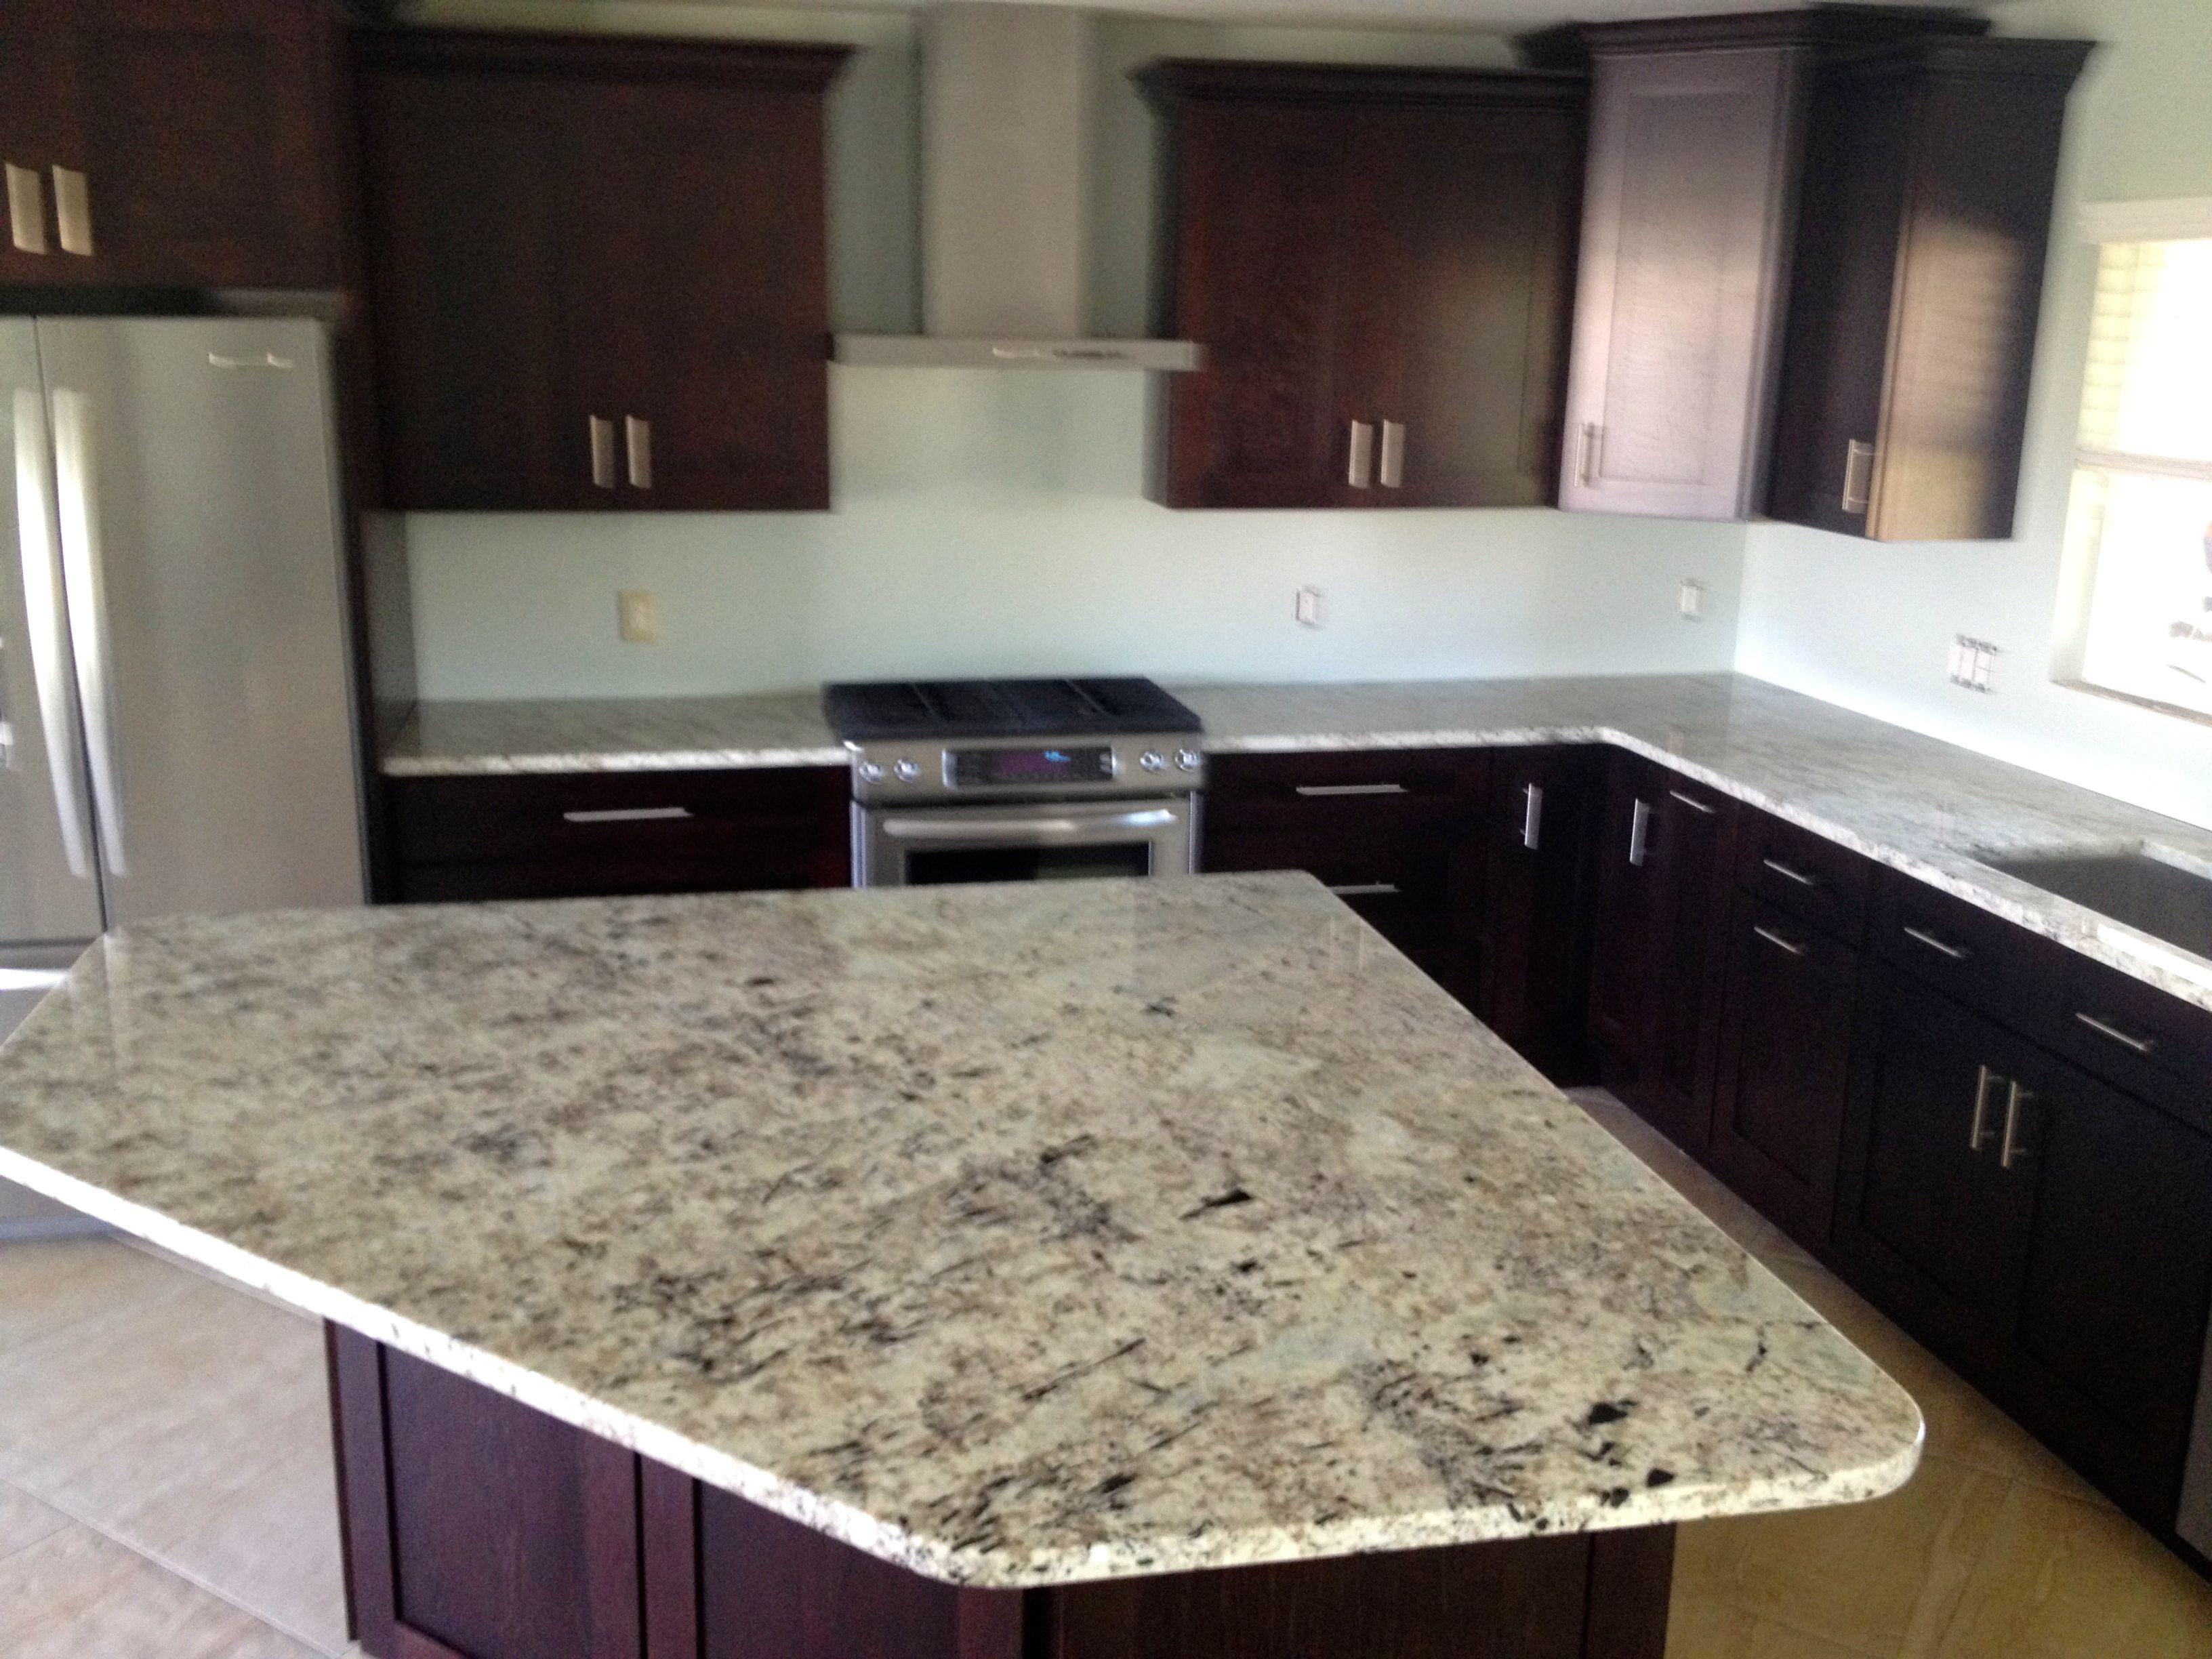 White Galaxy Granite Kitchen Mocha Shaker Cabinets Modern Hardware Galaxy White Granite Tops